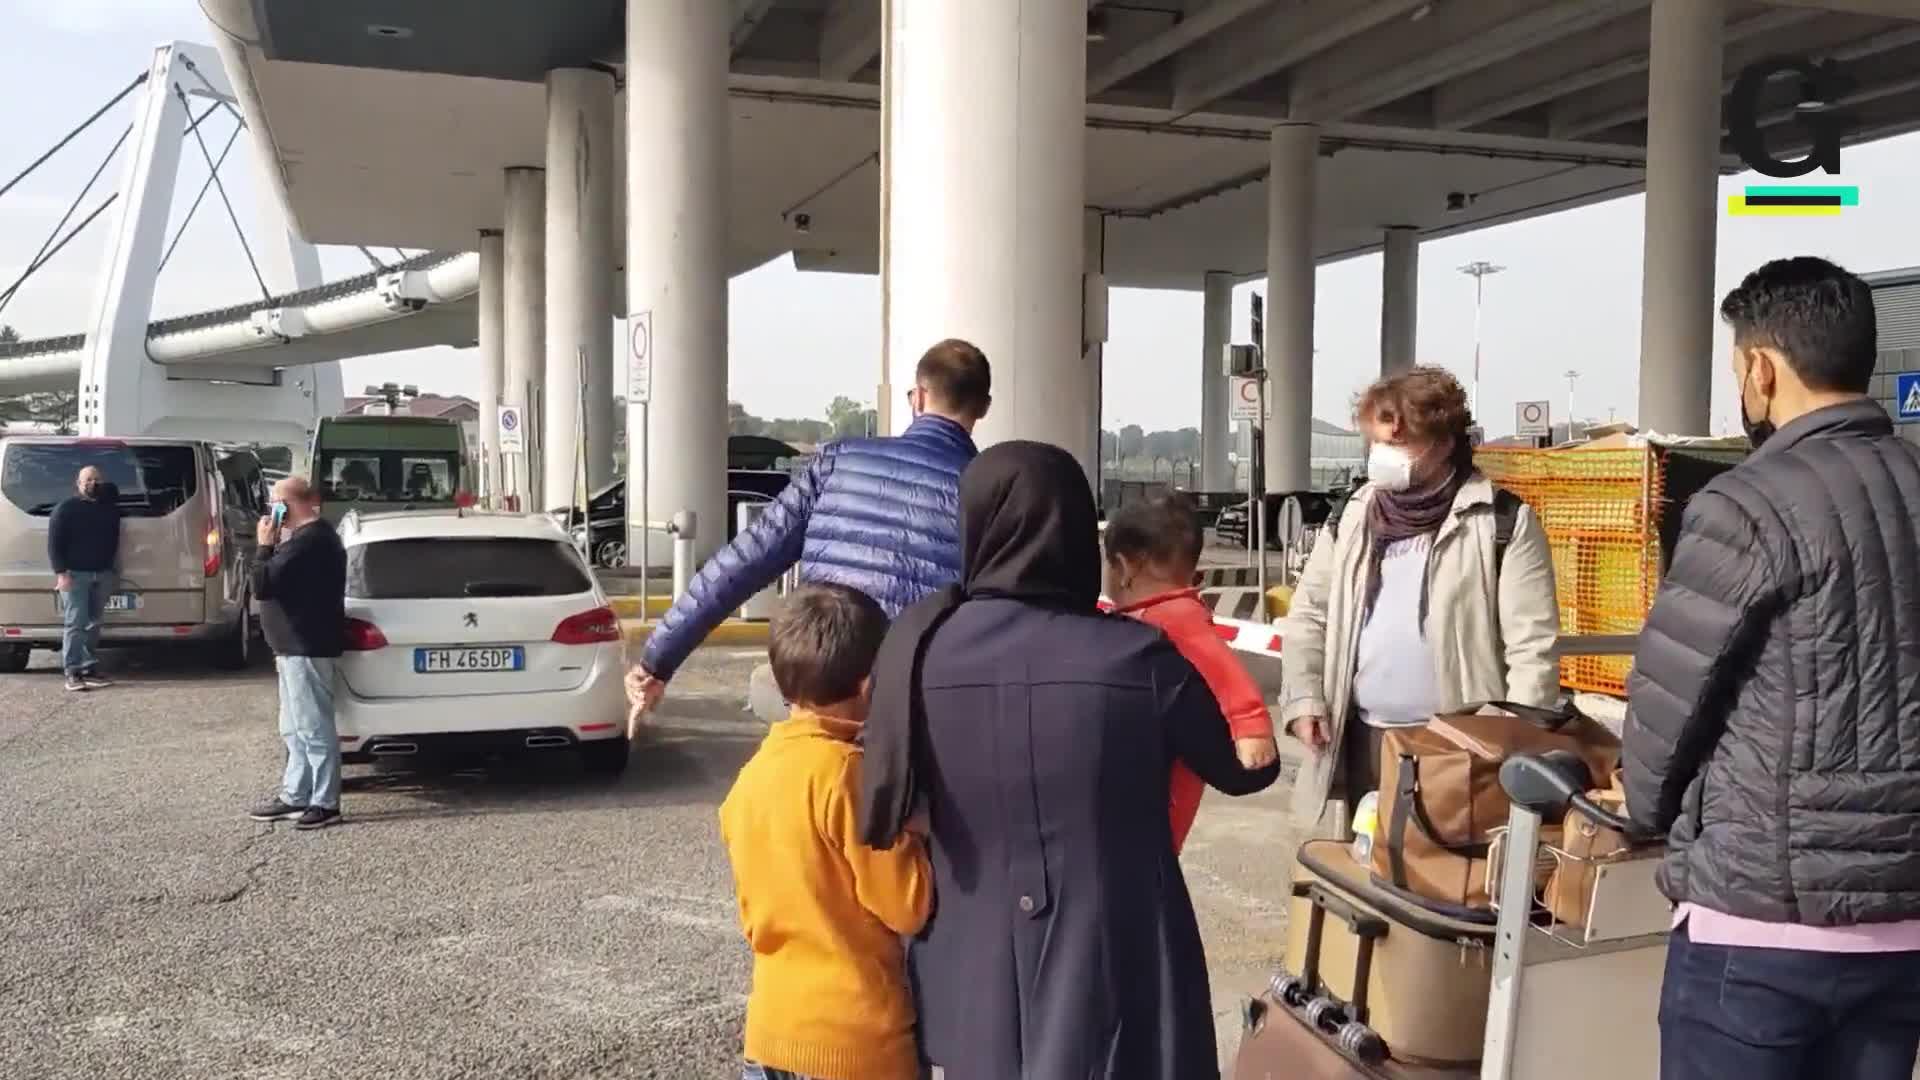 L'arrivo di Zahra a Malpensa